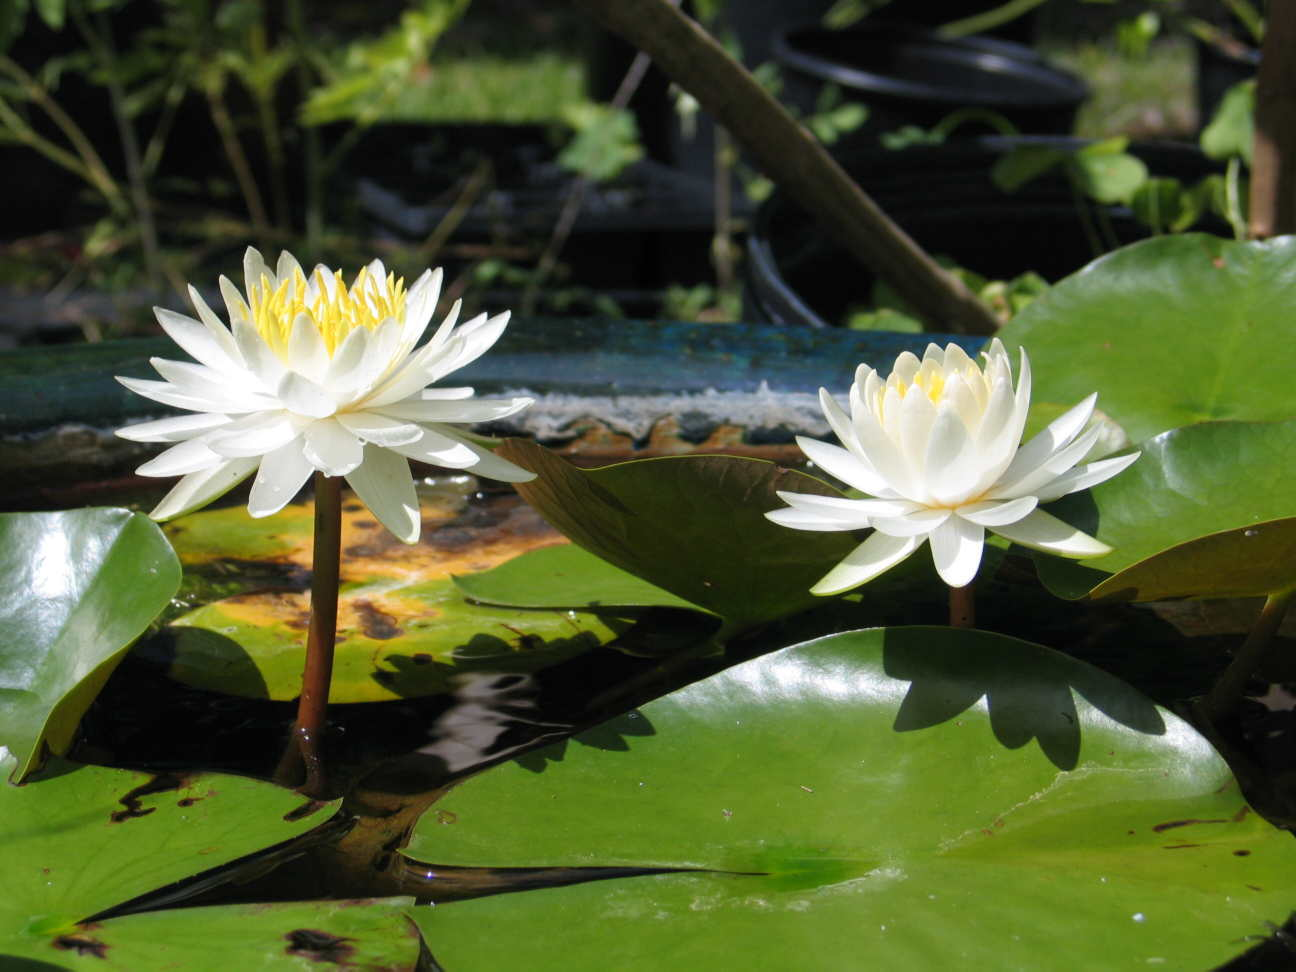 Dwarf Lilies